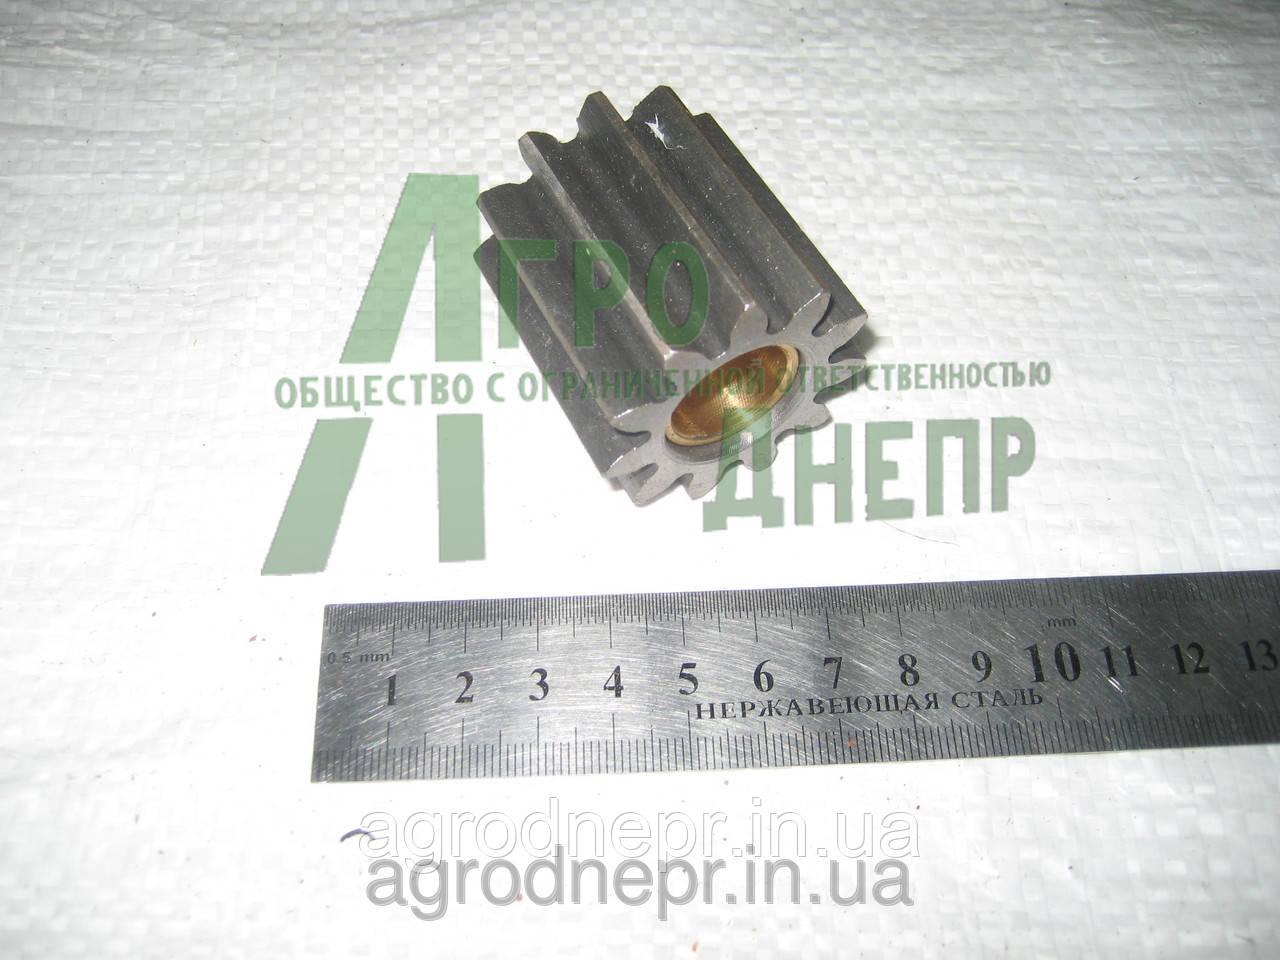 Колесо зубчатое масляного насоса Д-65 Д08-008-А1 Д08-008-А1